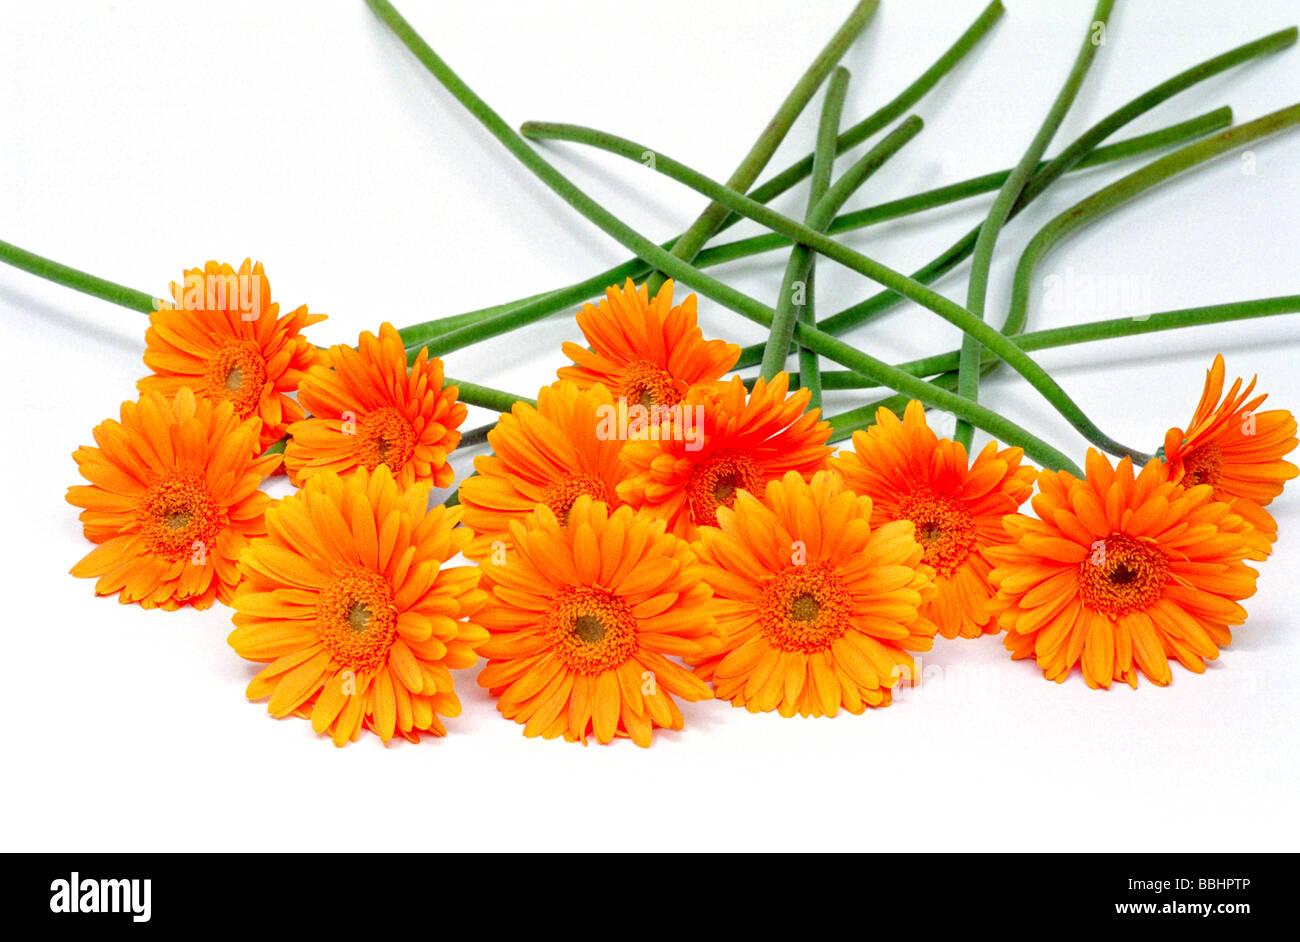 Orange gerberas a daisy type flower on a plain background stock orange gerberas a daisy type flower on a plain background dhlflorist Images